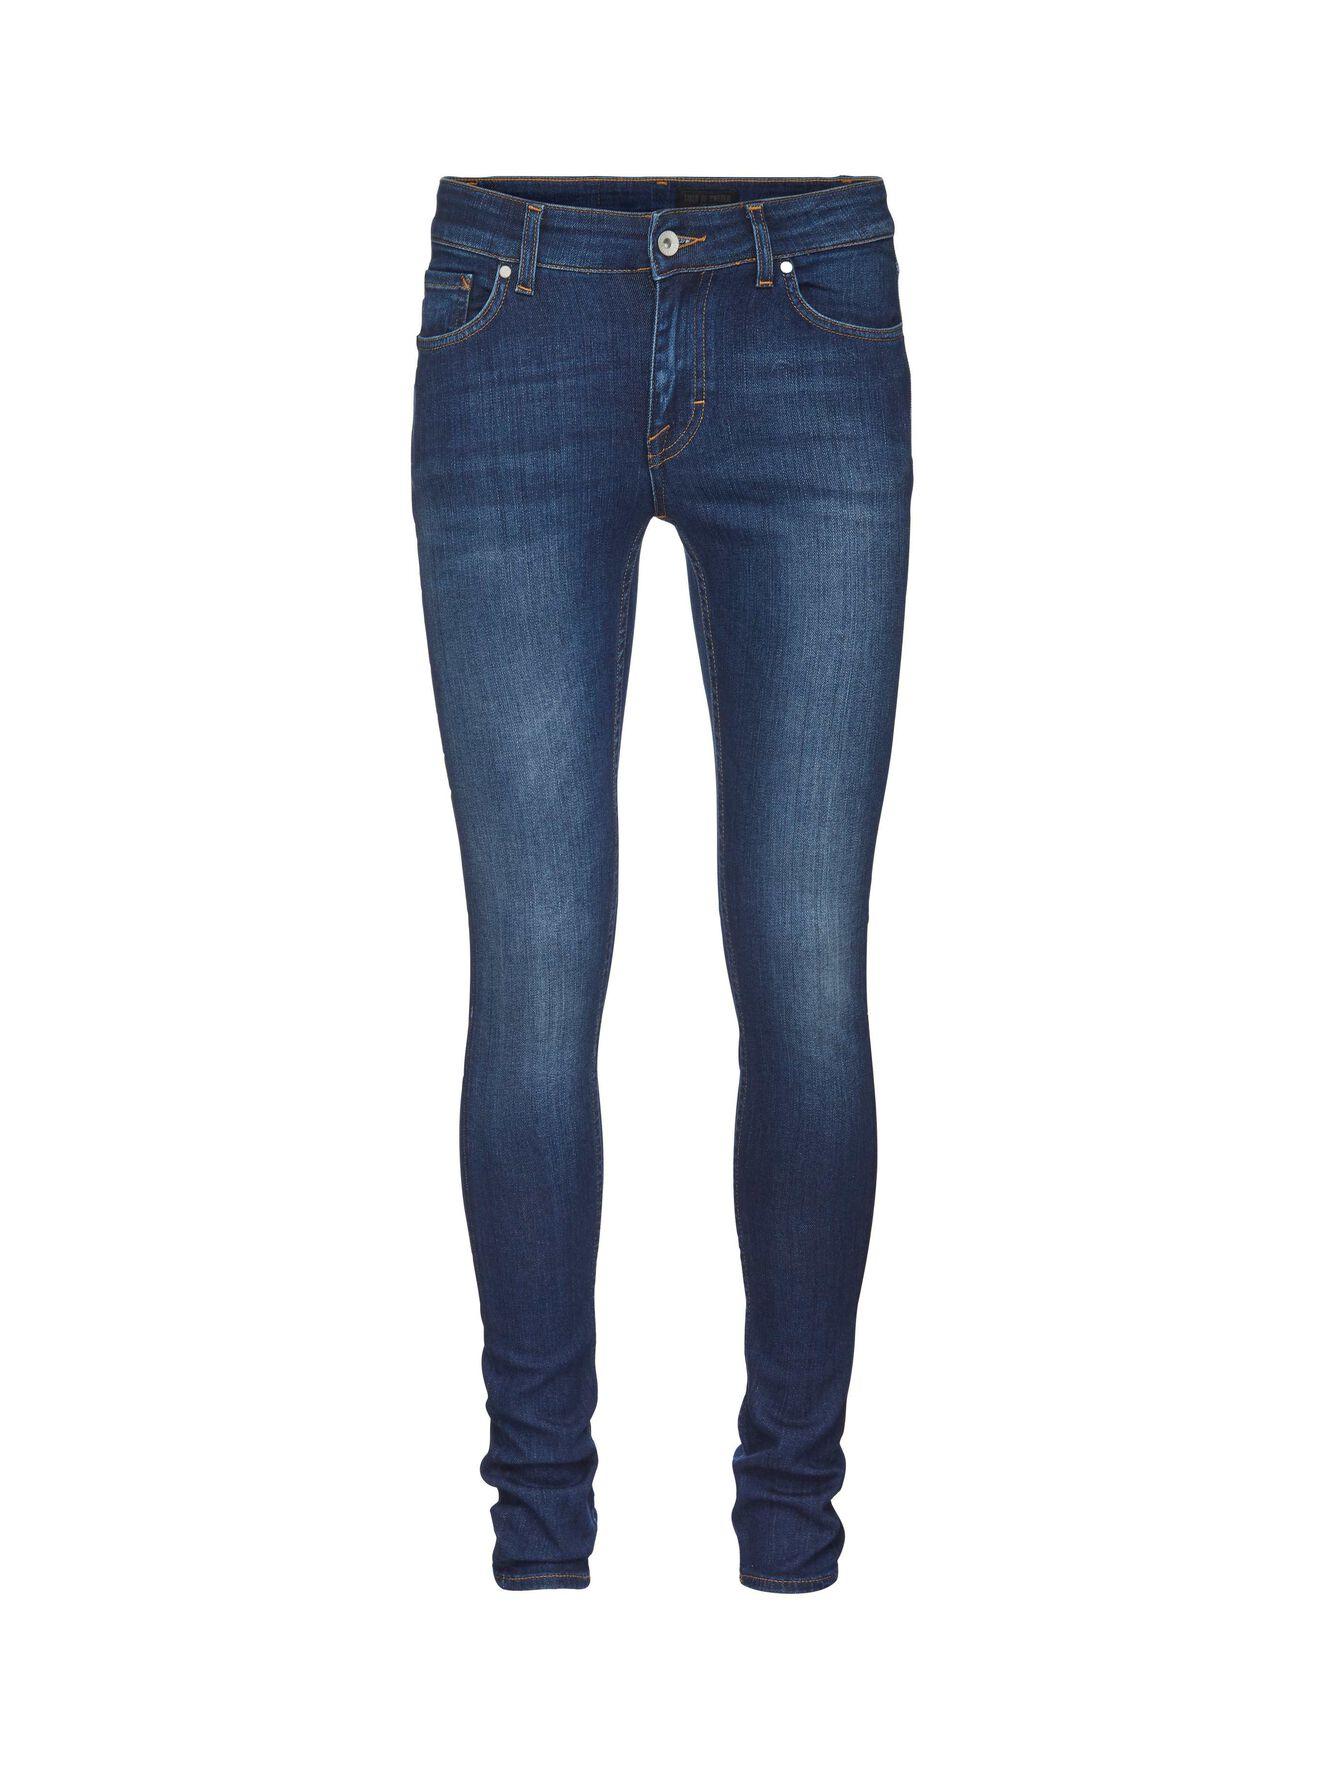 Slight jeans in Royal Blue from Tiger of Sweden